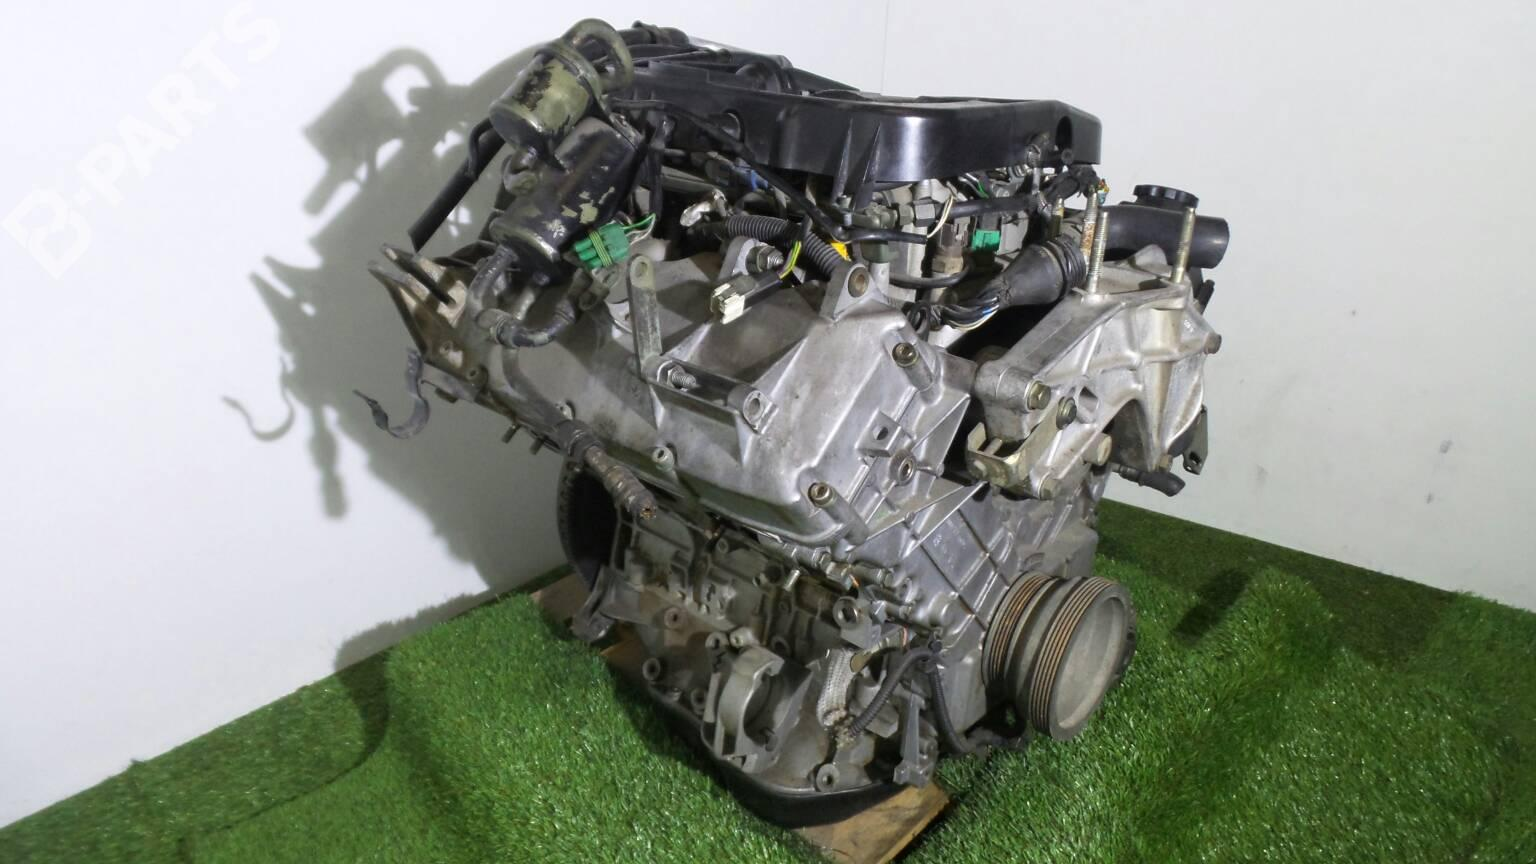 Engine Peugeot 605 6b 30 Sv 24 76594 Fuse Box Complete 200hp Ukz Zpj4